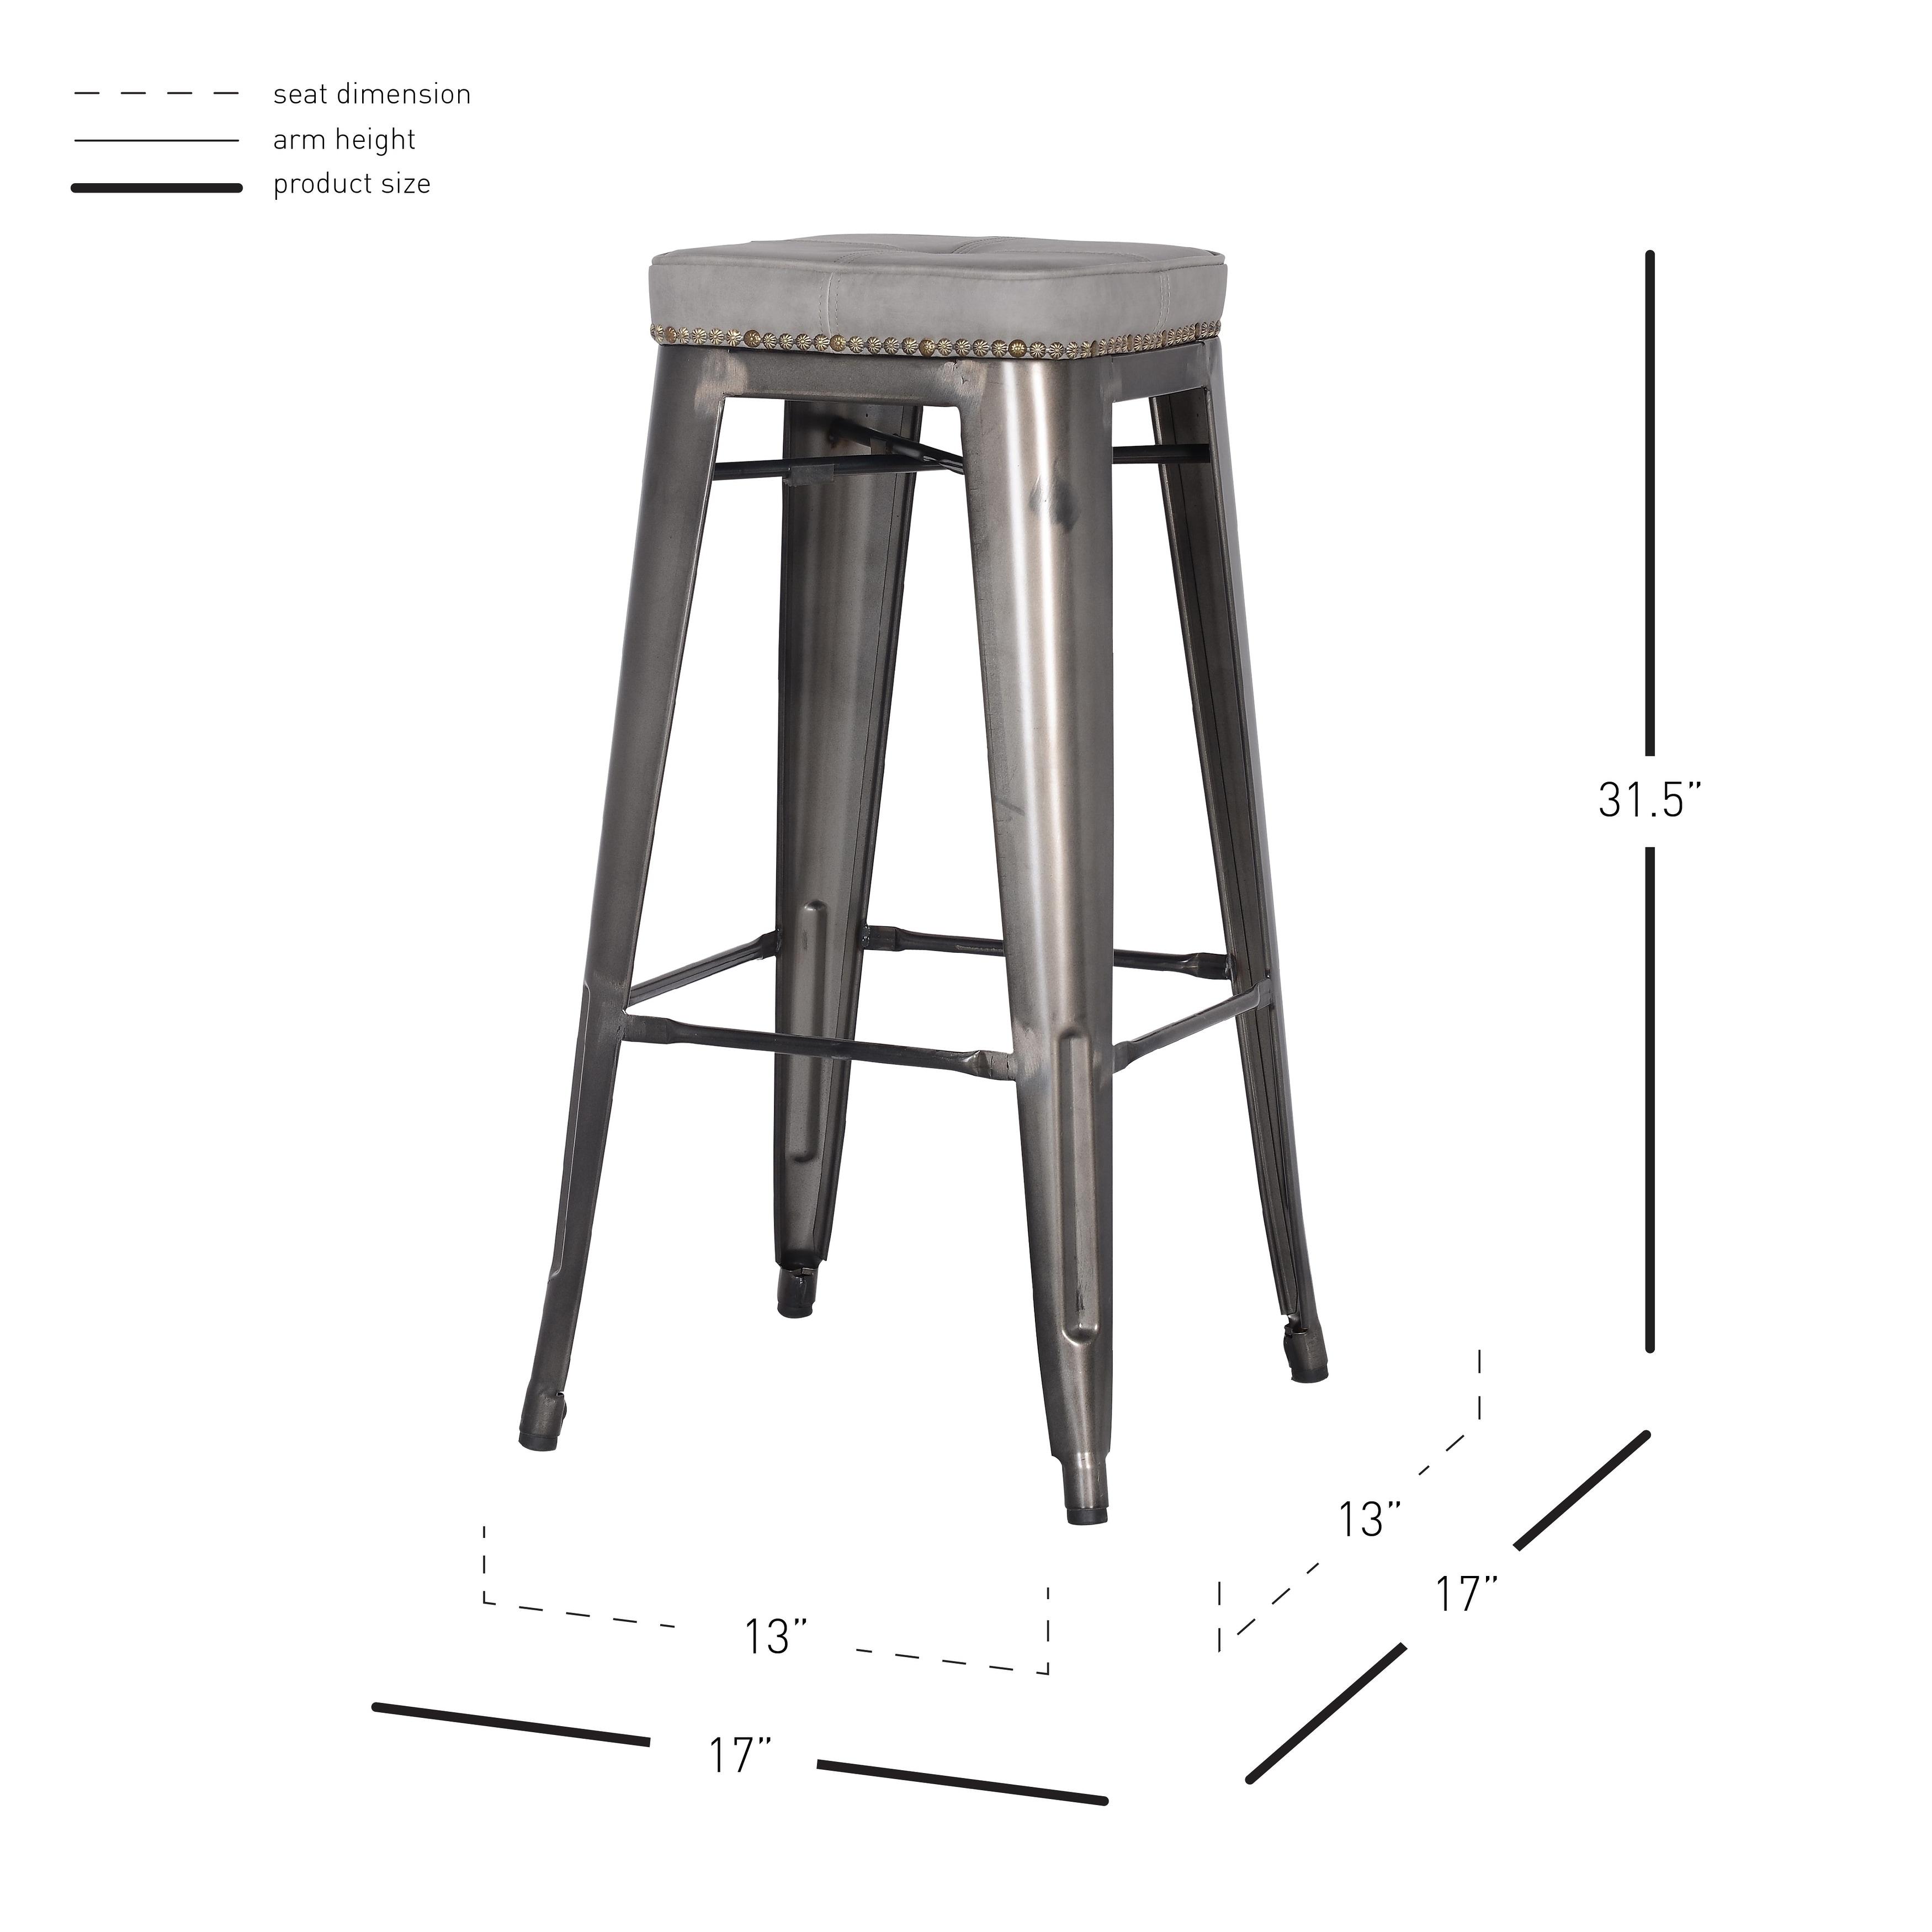 Cool Metropolis Pu Leather Metal Backless Bar Stool Set Of 4 Creativecarmelina Interior Chair Design Creativecarmelinacom